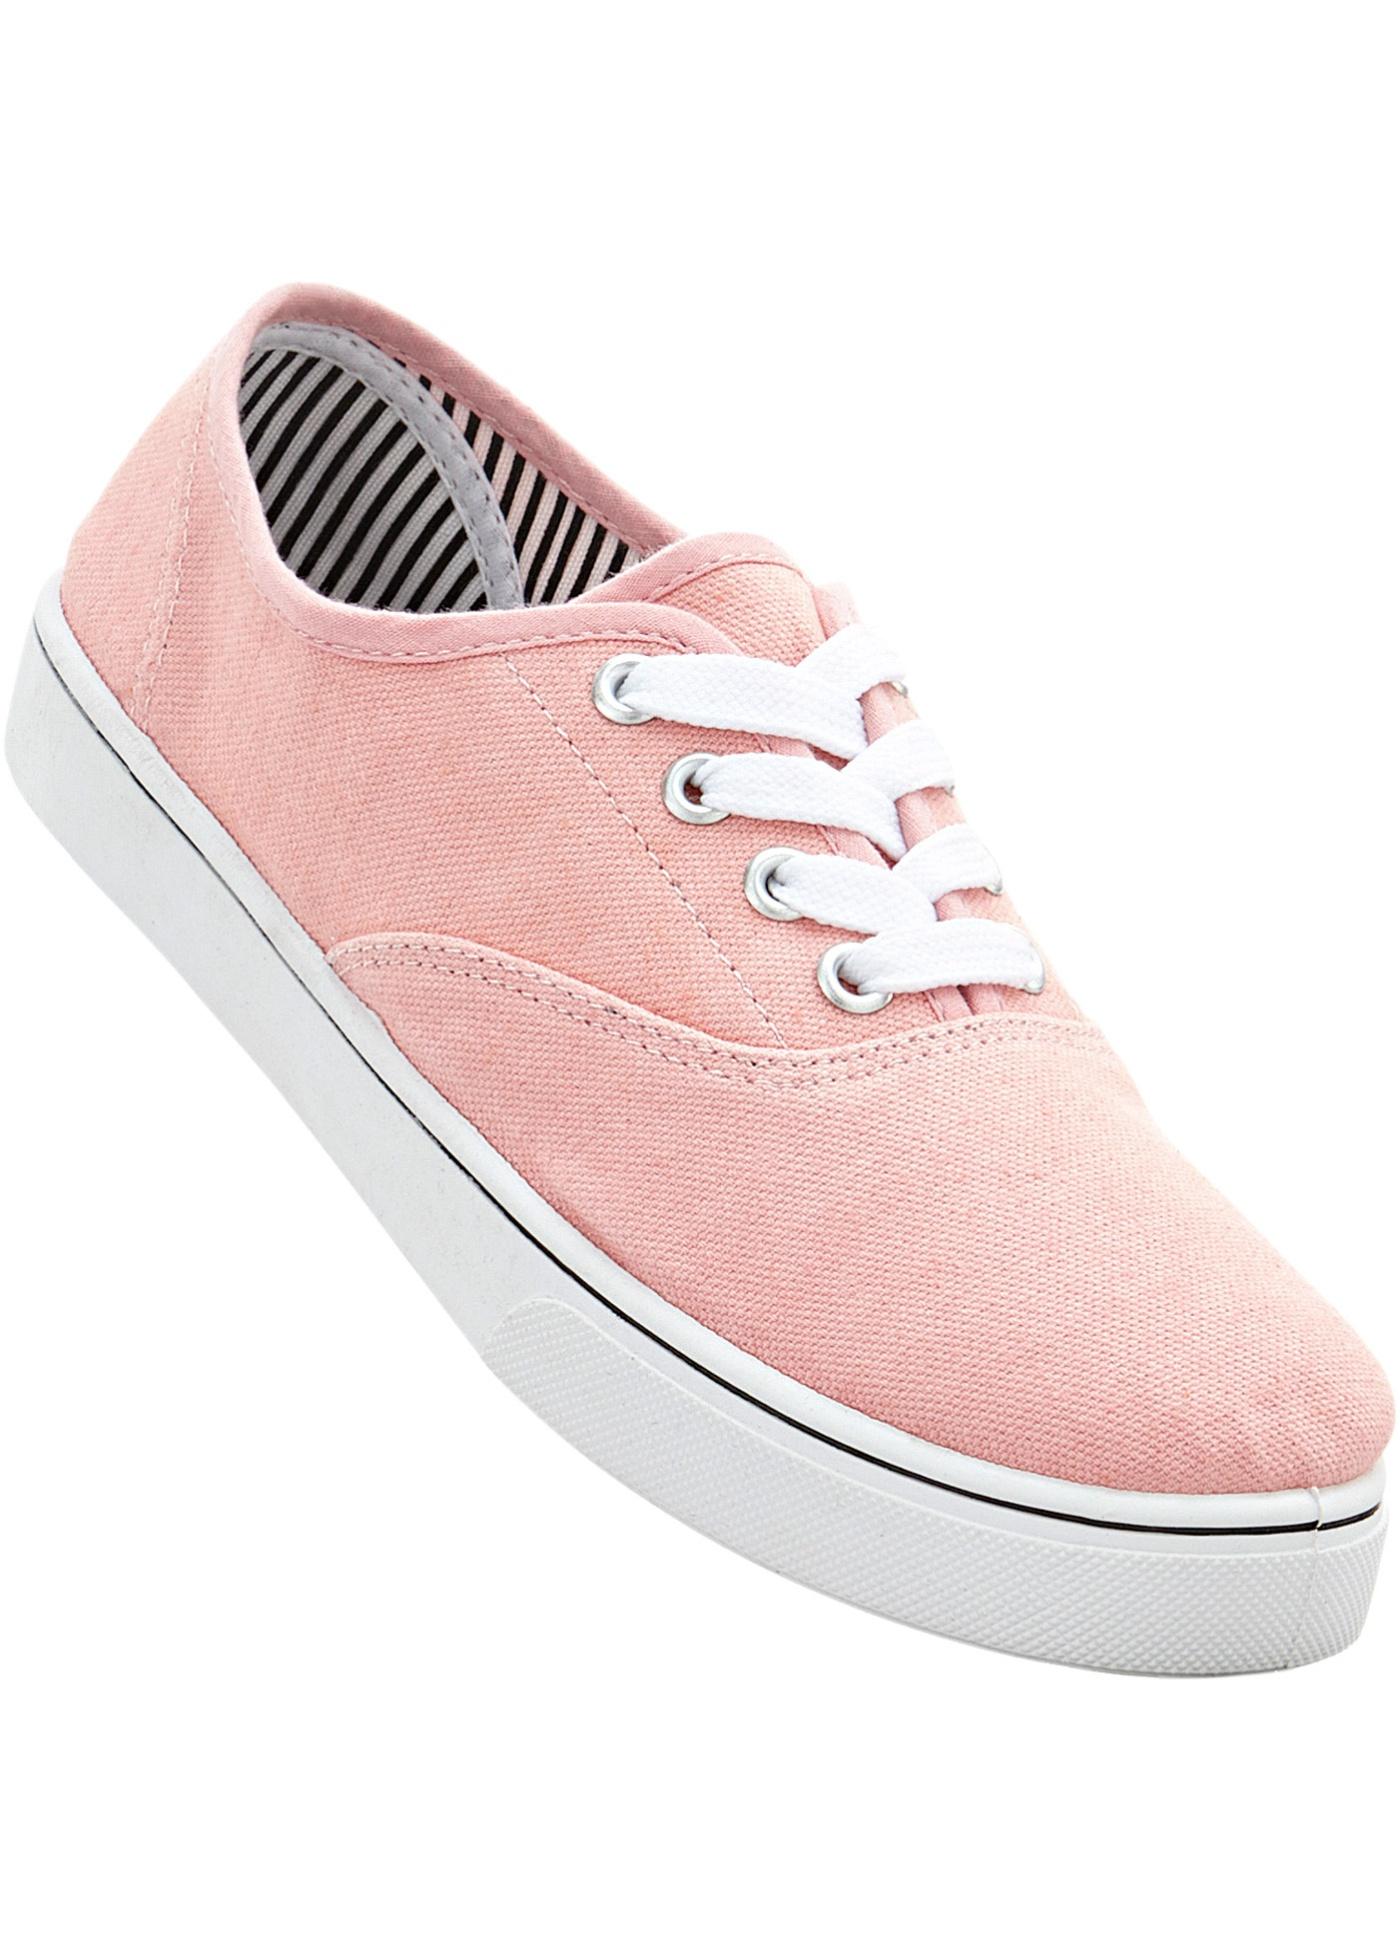 Sneaker  rosa  - bpc bonp